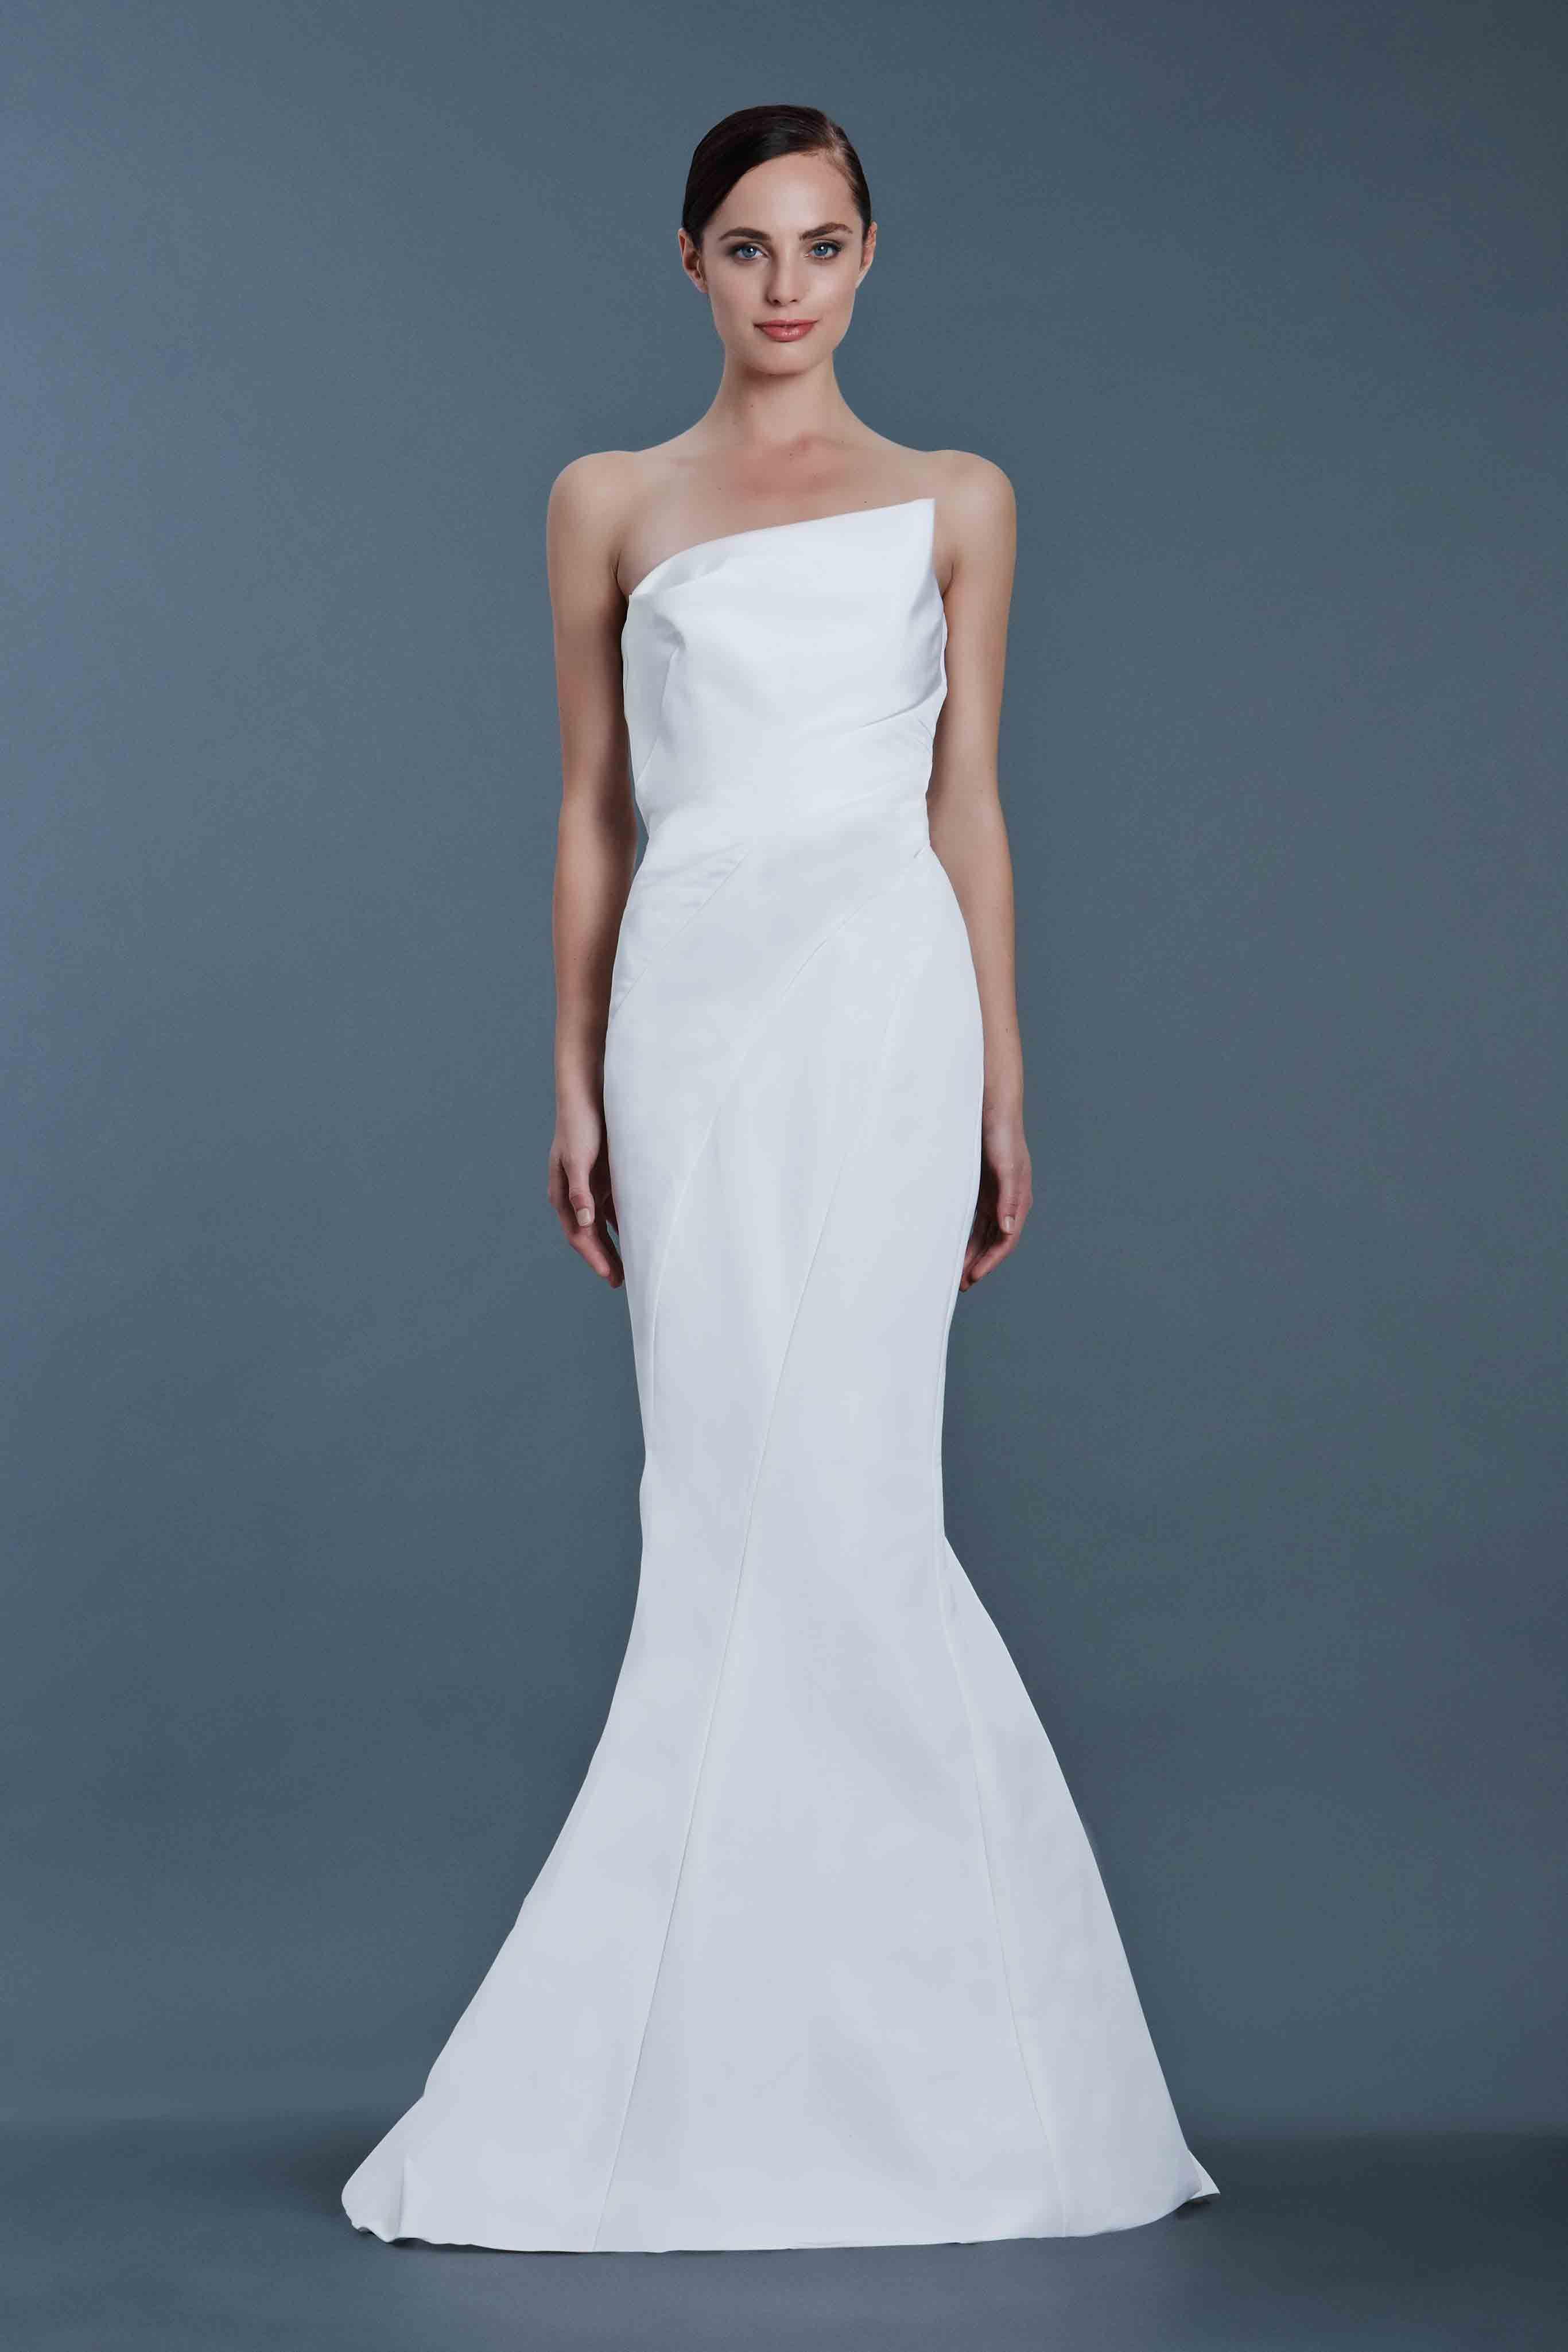 J Mendel Simple Bridal Gowns Bridal Fashion Week J Mendel Bridal